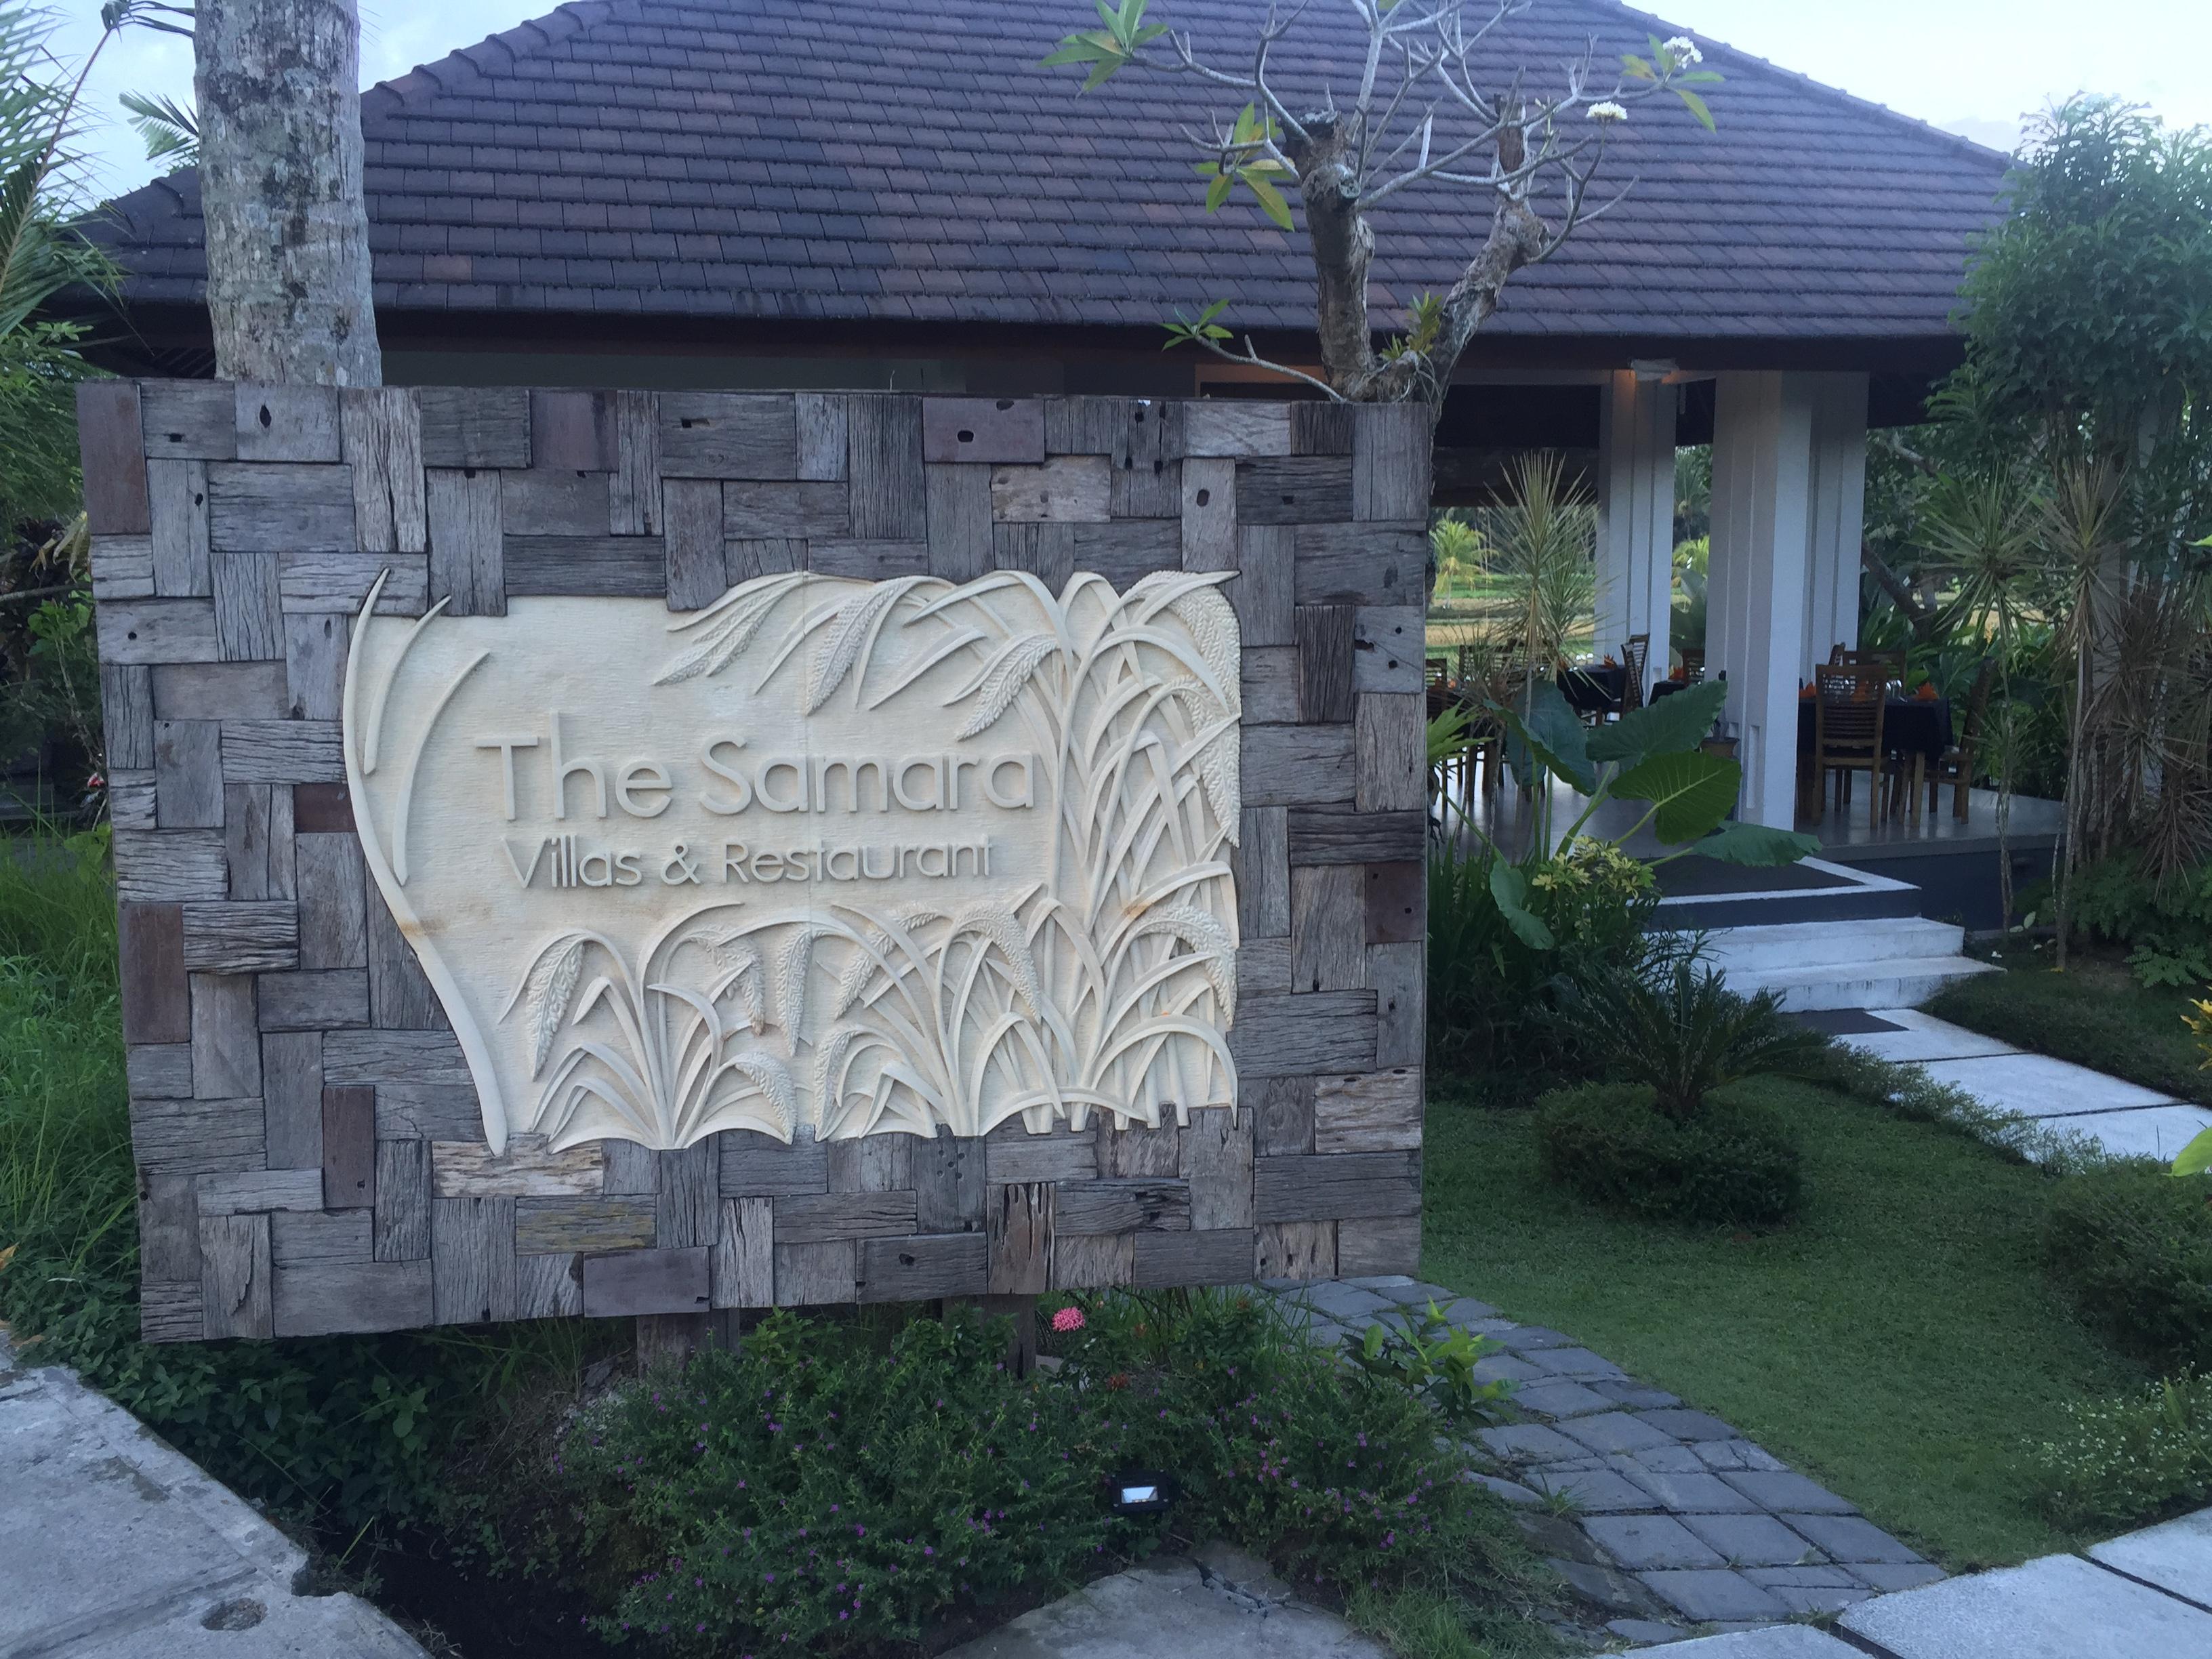 The Samara Villas & Restaurant in Ubud, Bali